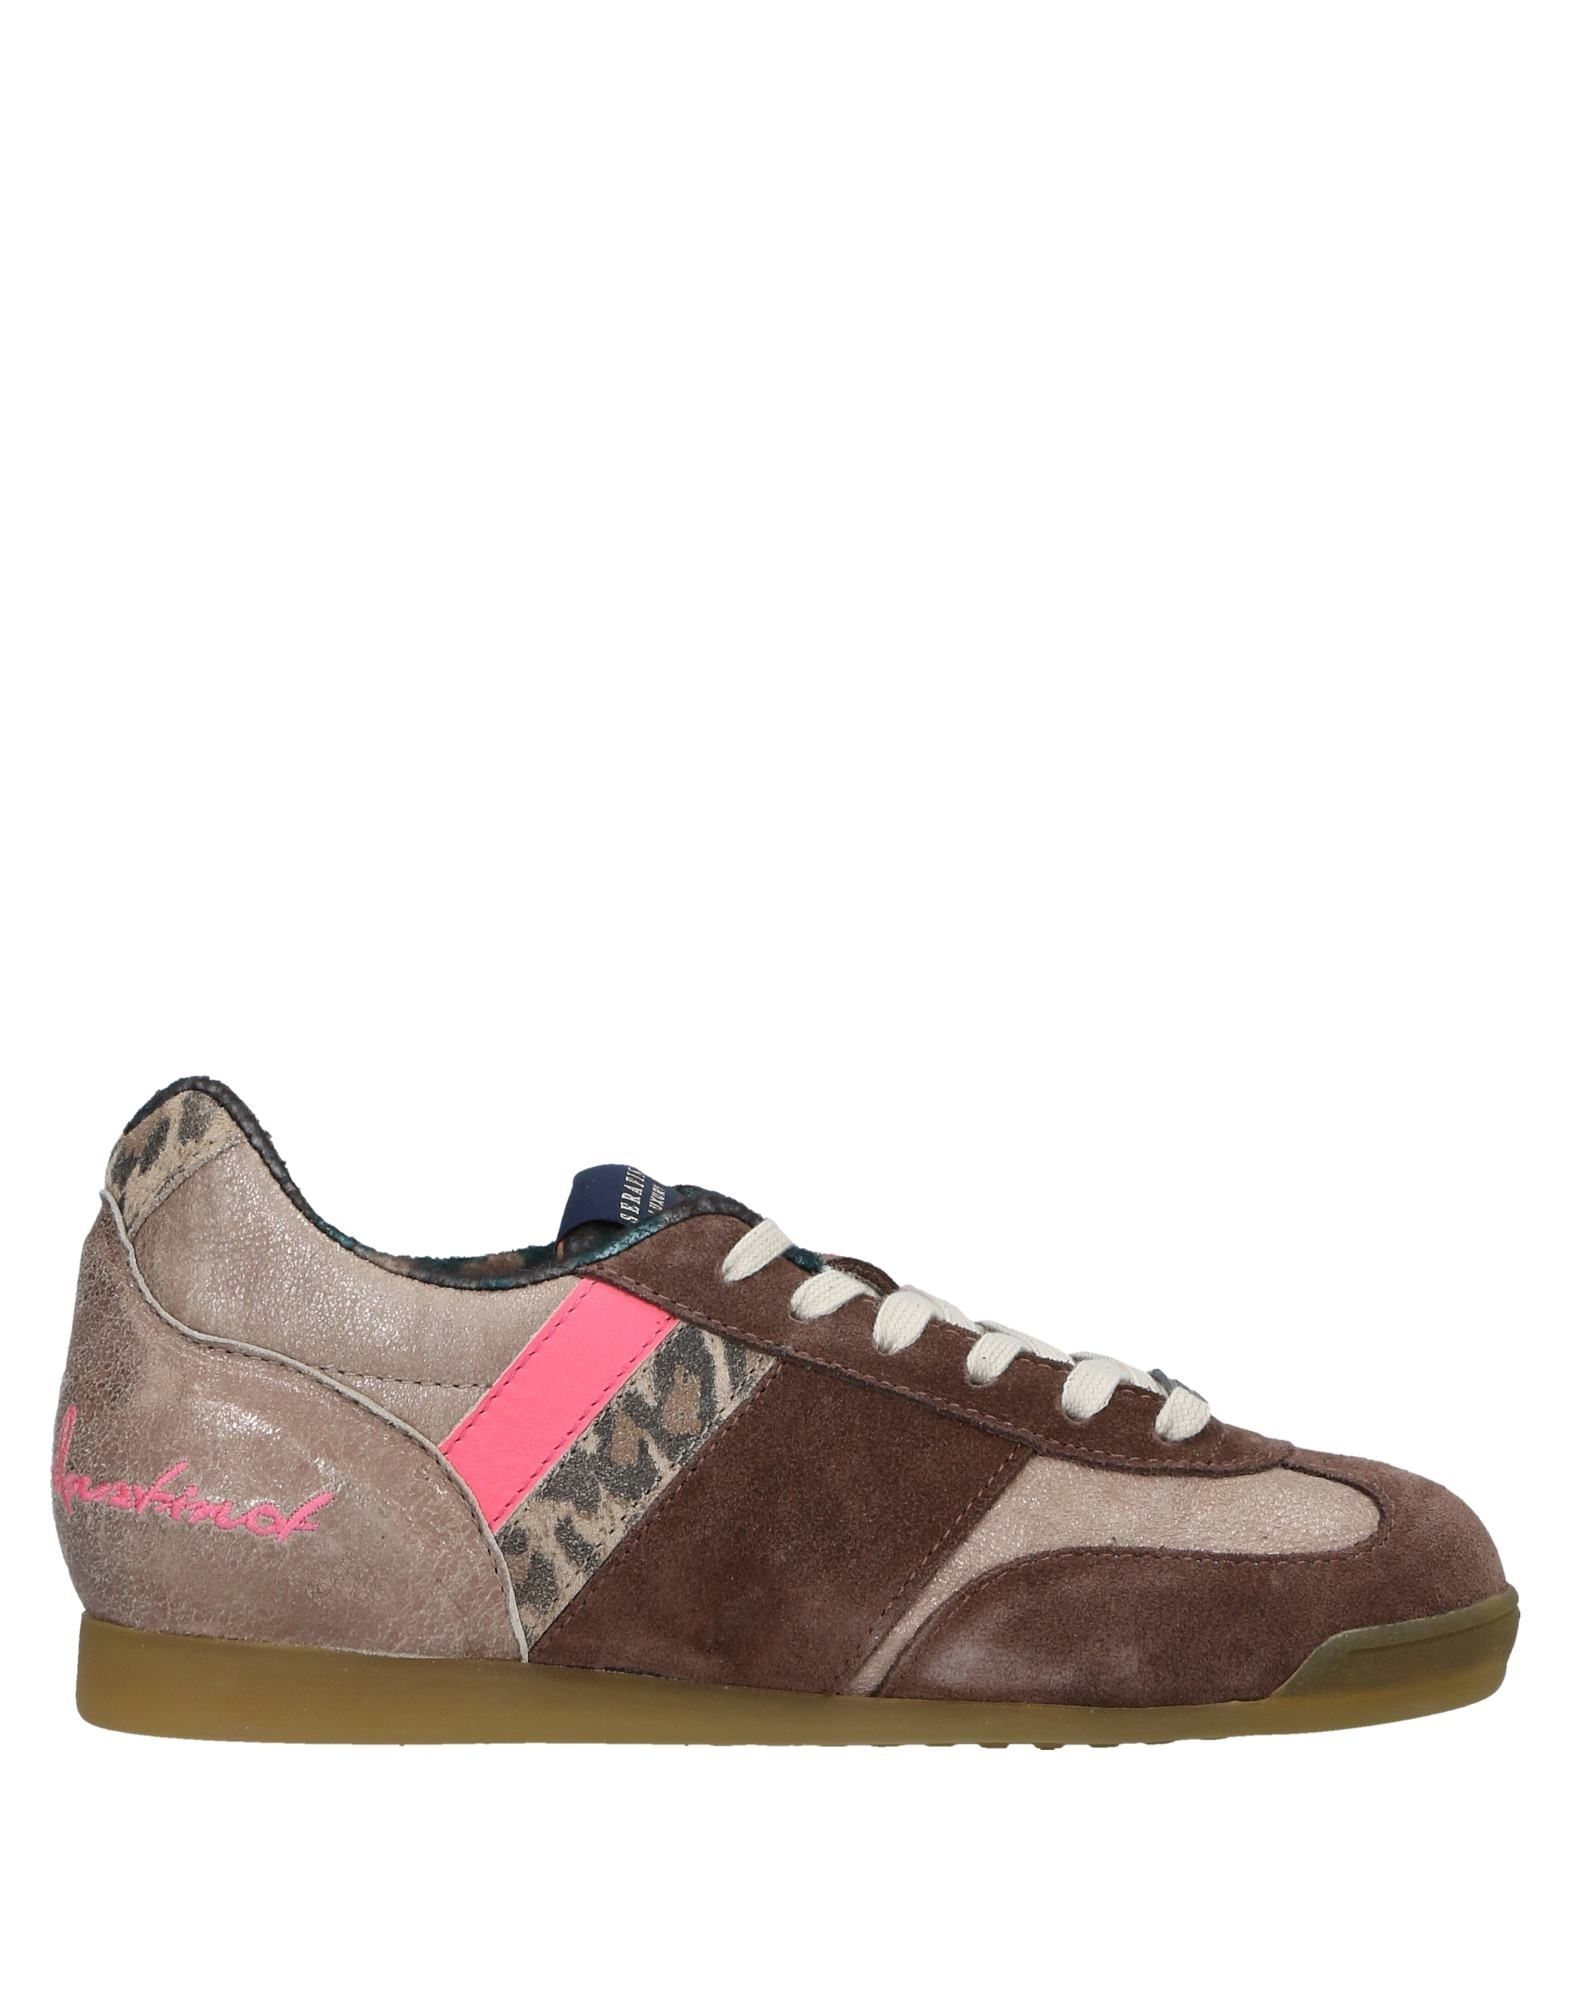 Serafini Sneakers Damen  11536270UL Gute Qualität beliebte Schuhe